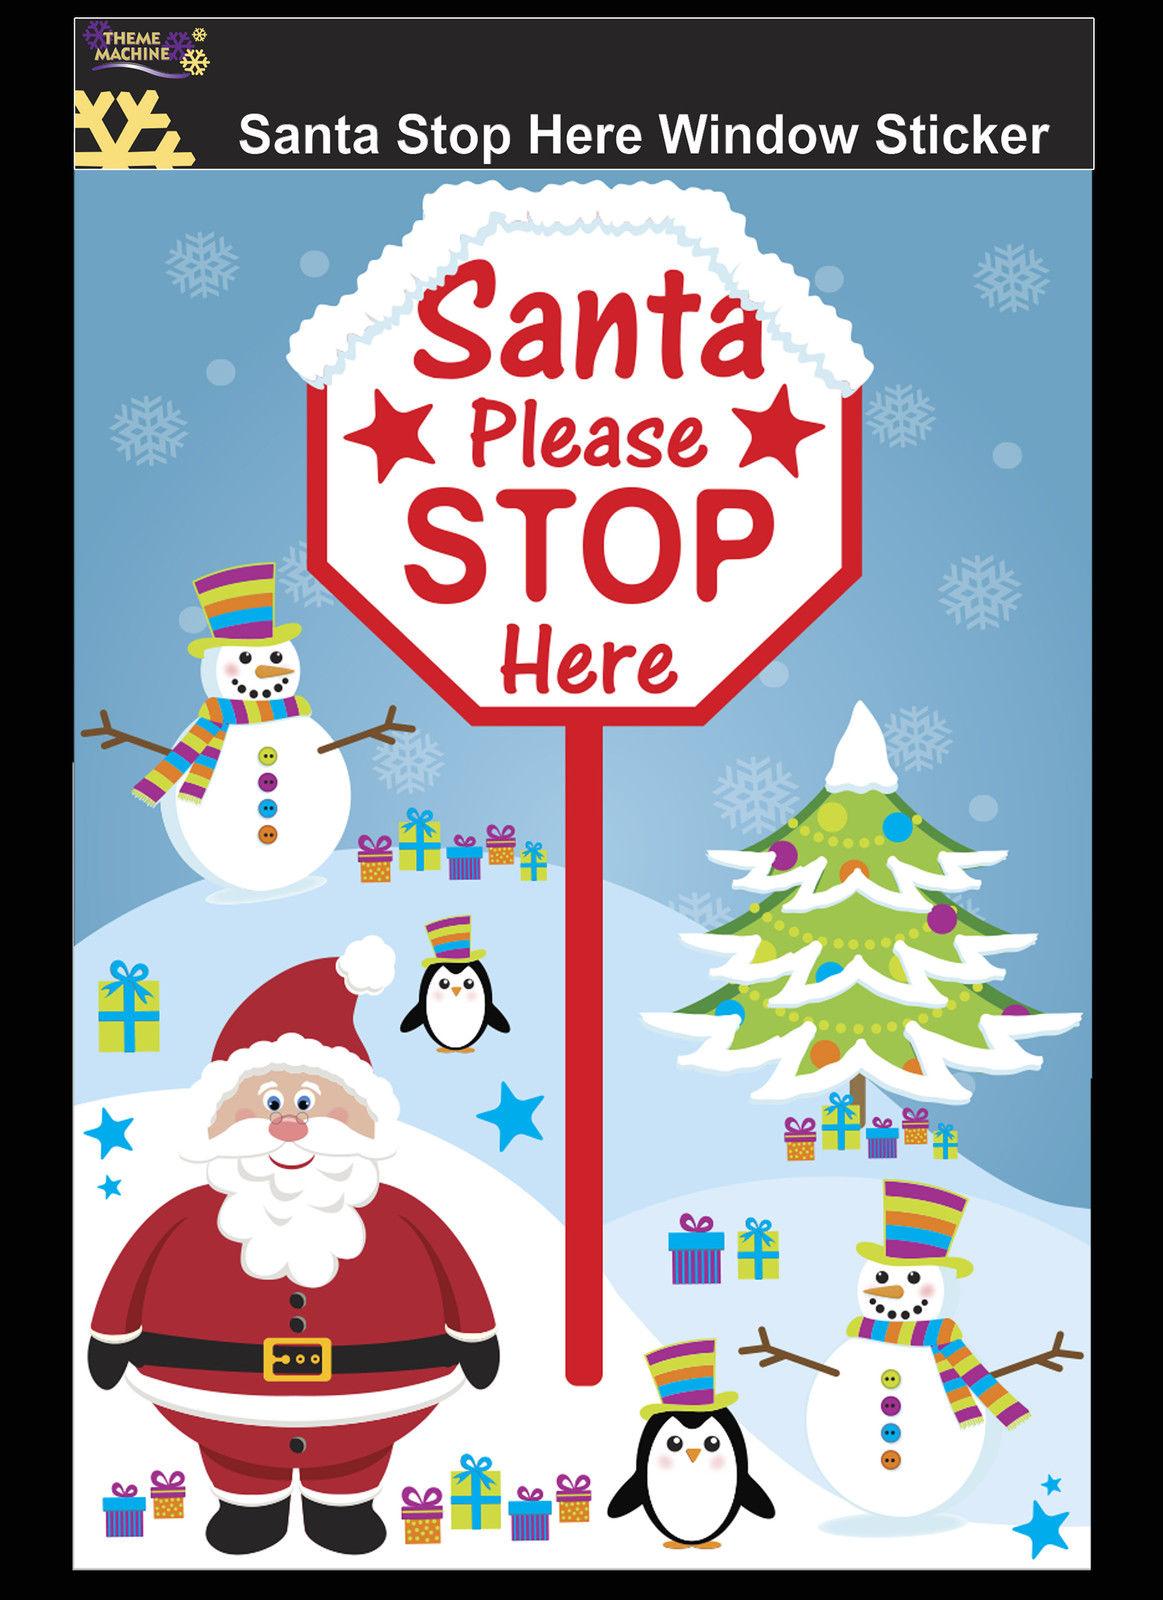 Here sign window sticker christmas decoration childs window decoratio